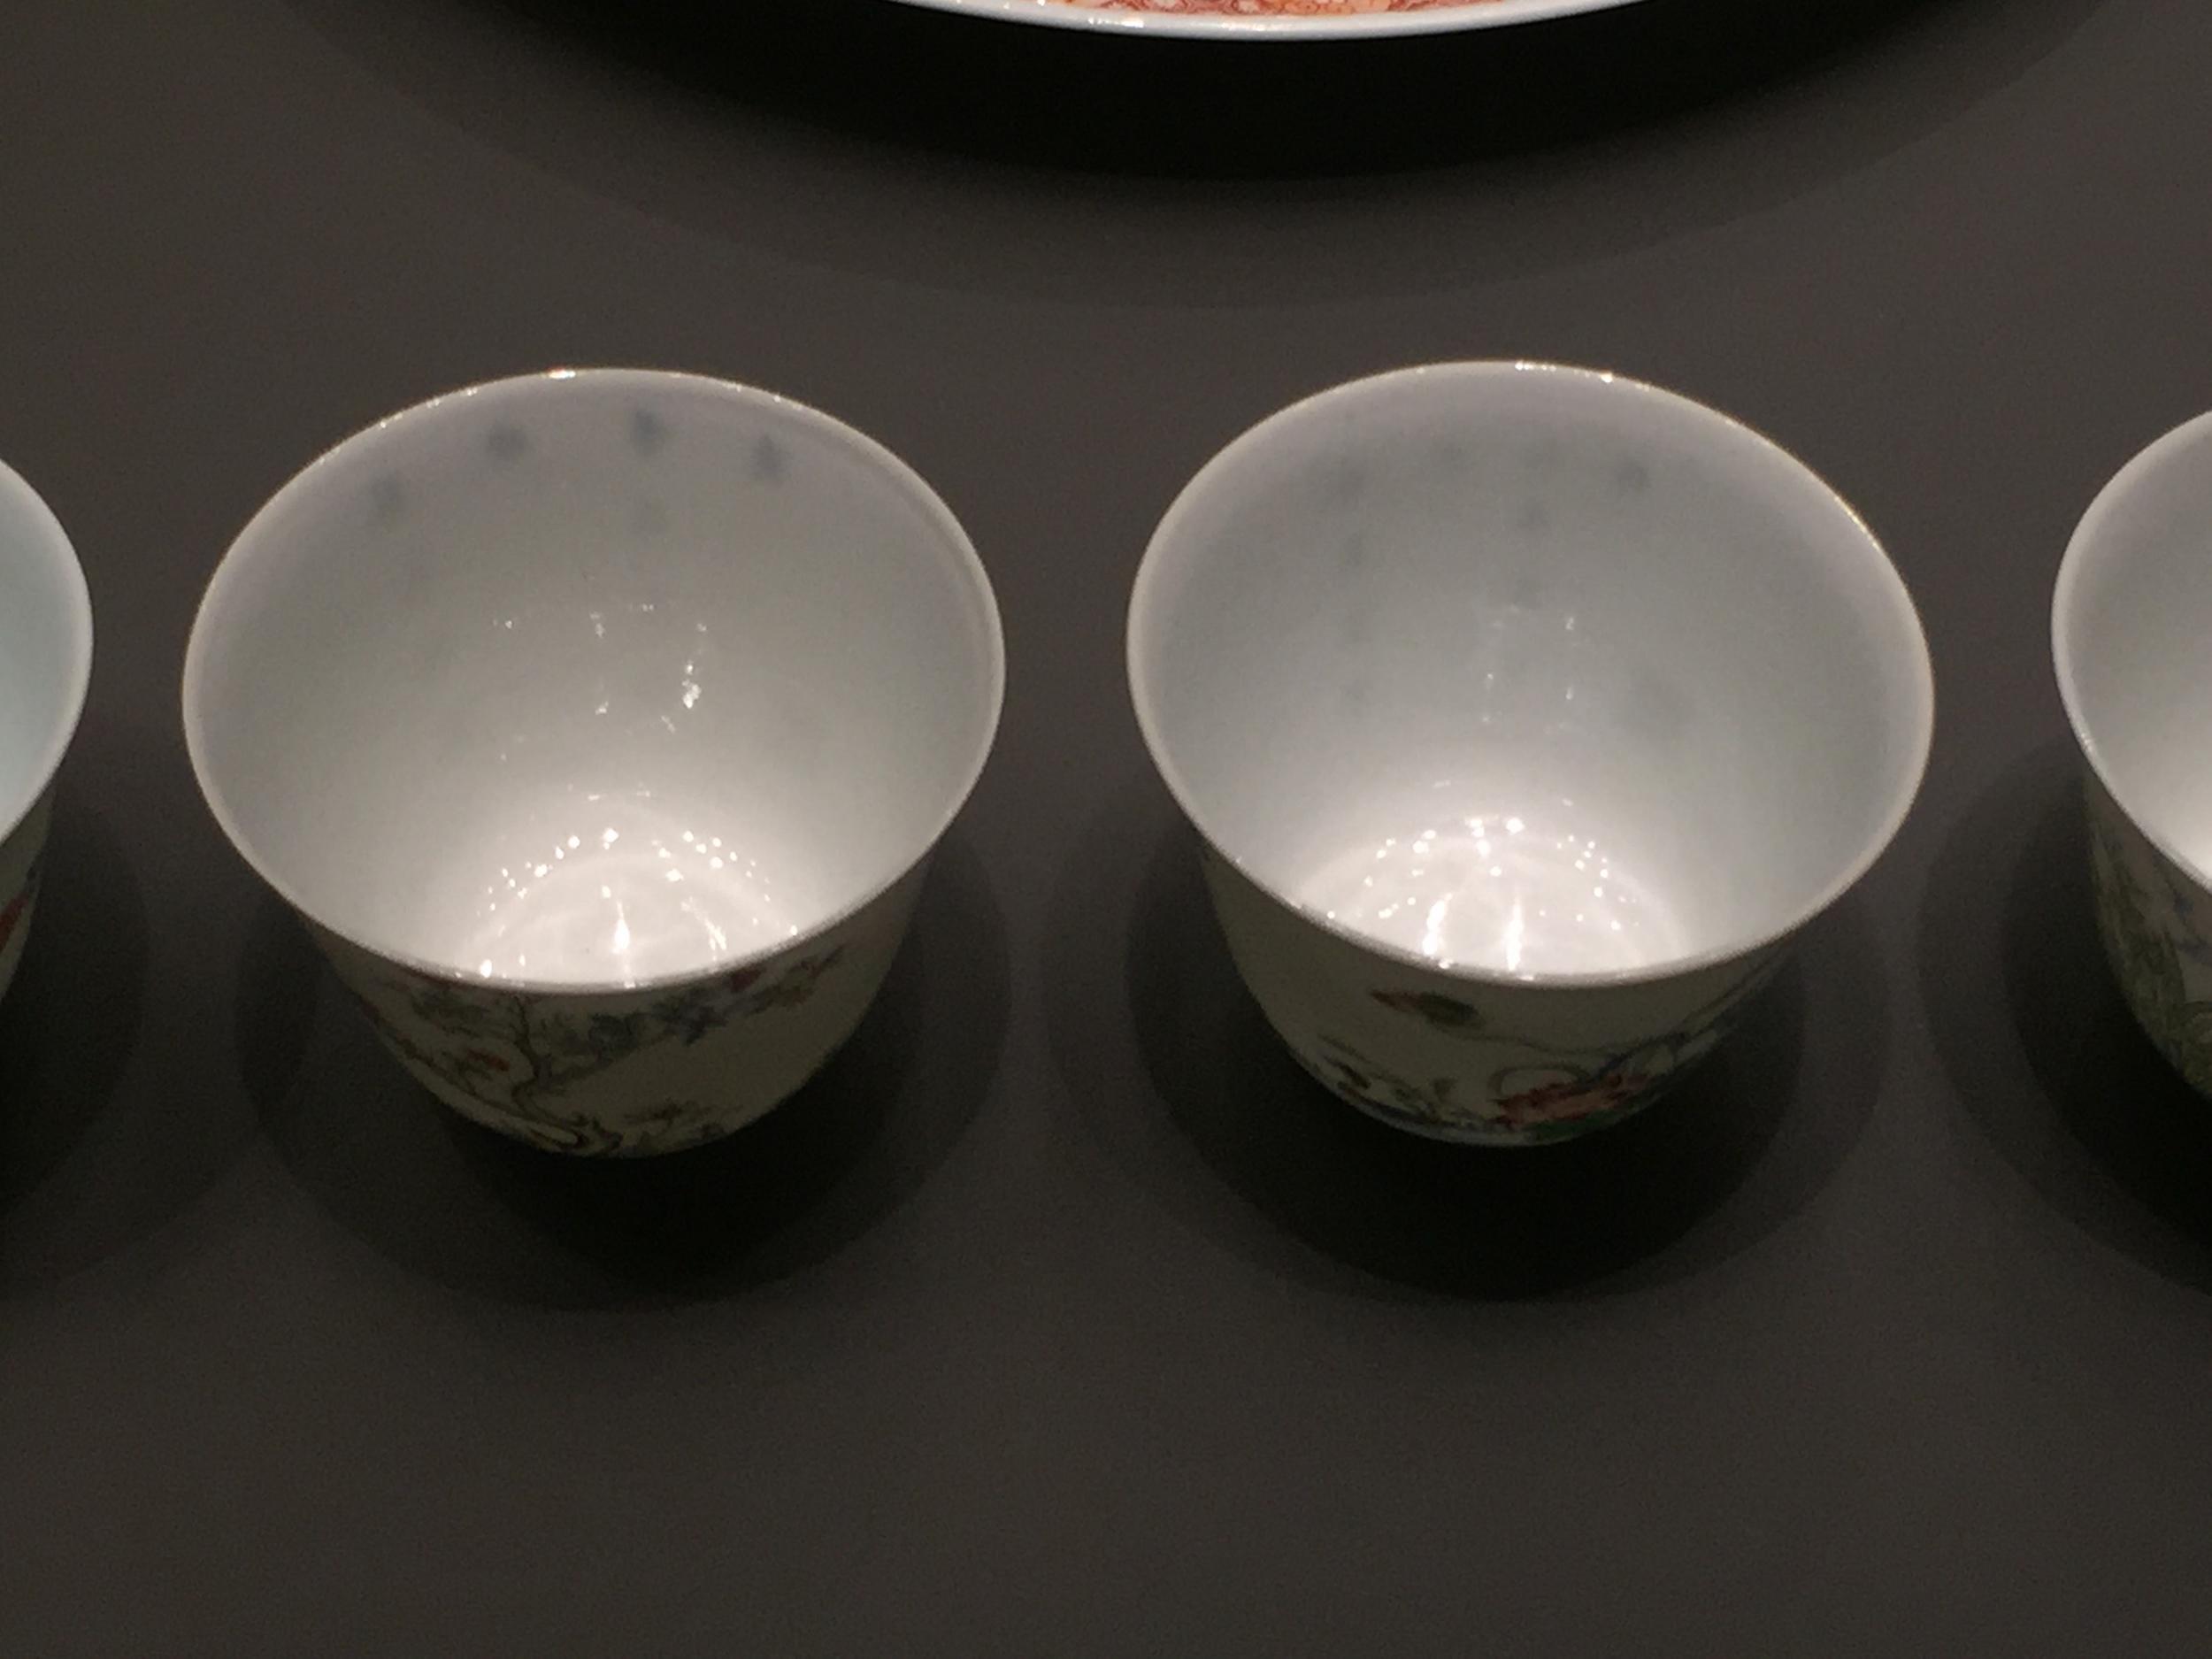 Chinese-Porcelain-British-Museum-Percival-David-jessewaugh.com-131.jpg